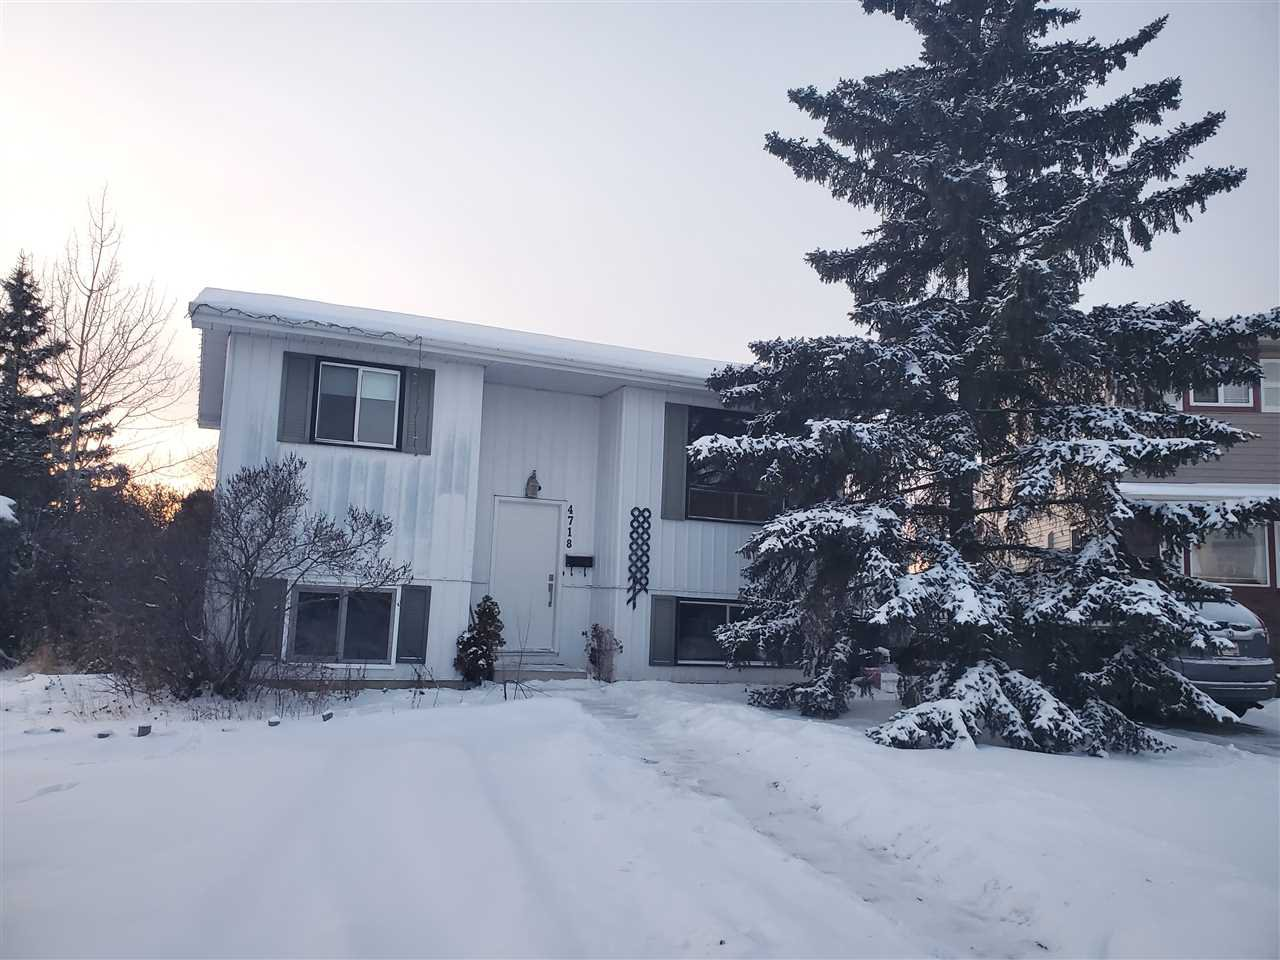 Main Photo: 4718 37A Avenue in Edmonton: Zone 29 House for sale : MLS®# E4183878